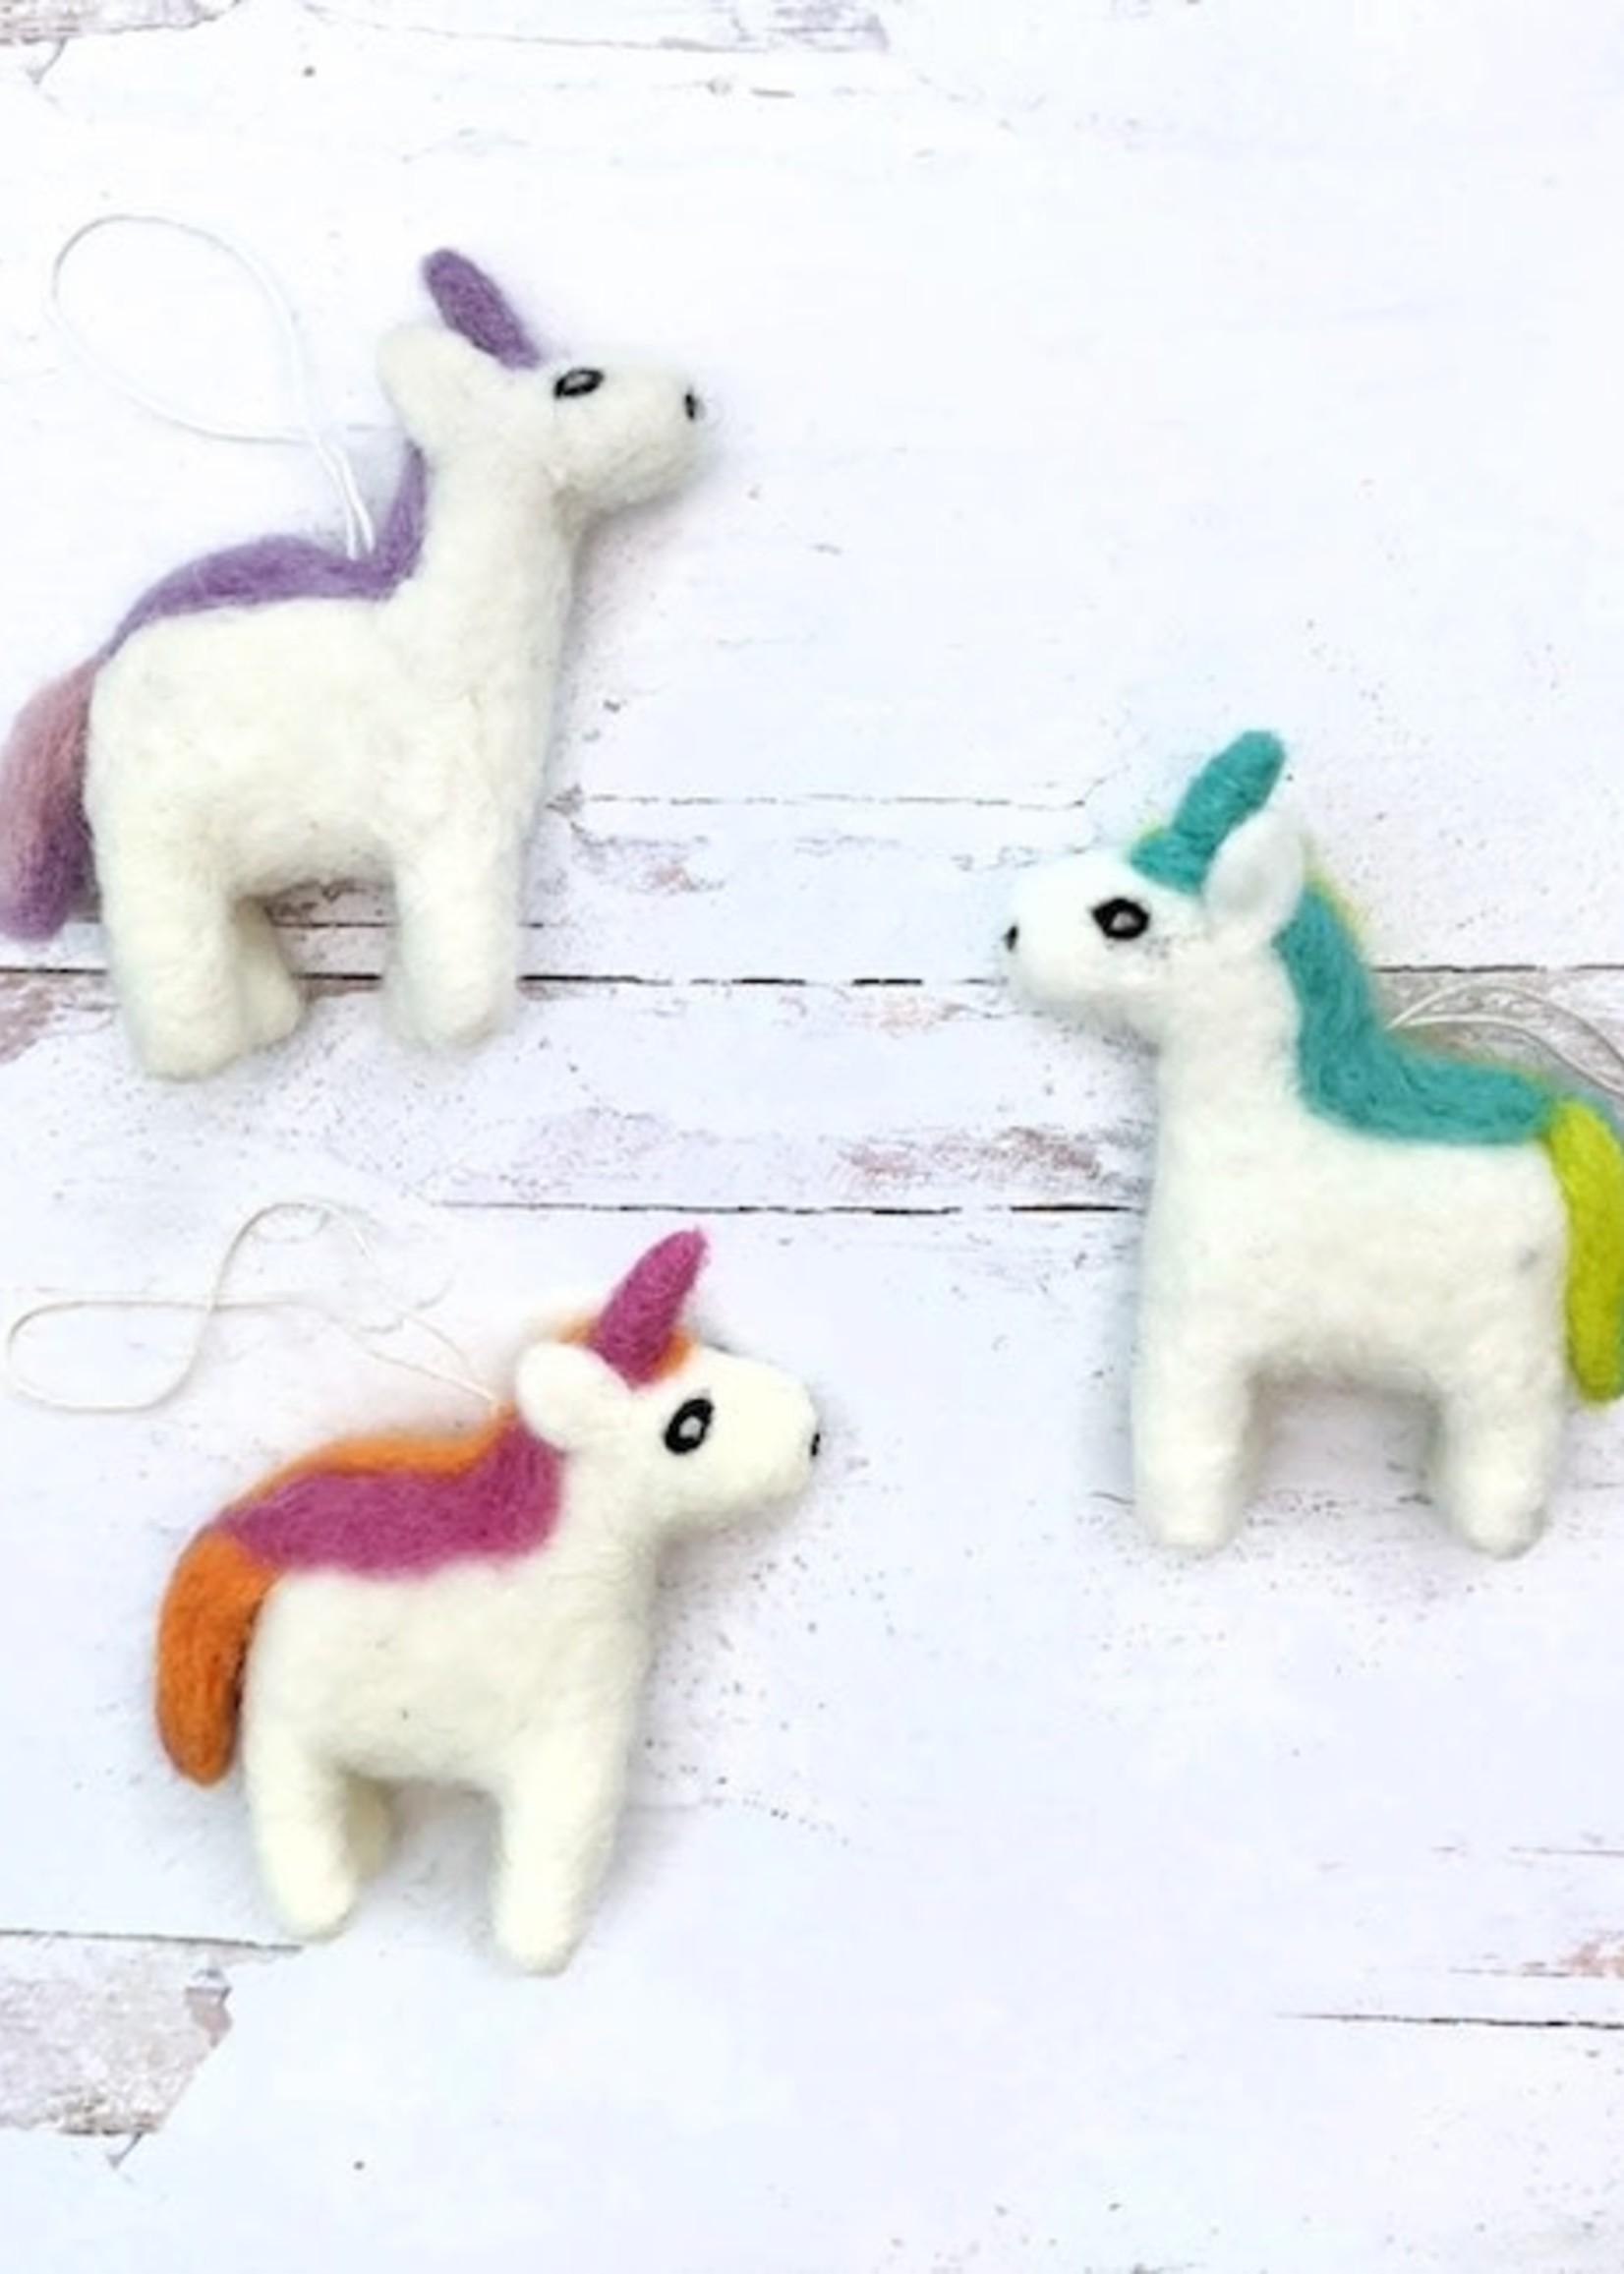 Friendsheep Green/Teal Unicorn Ornament